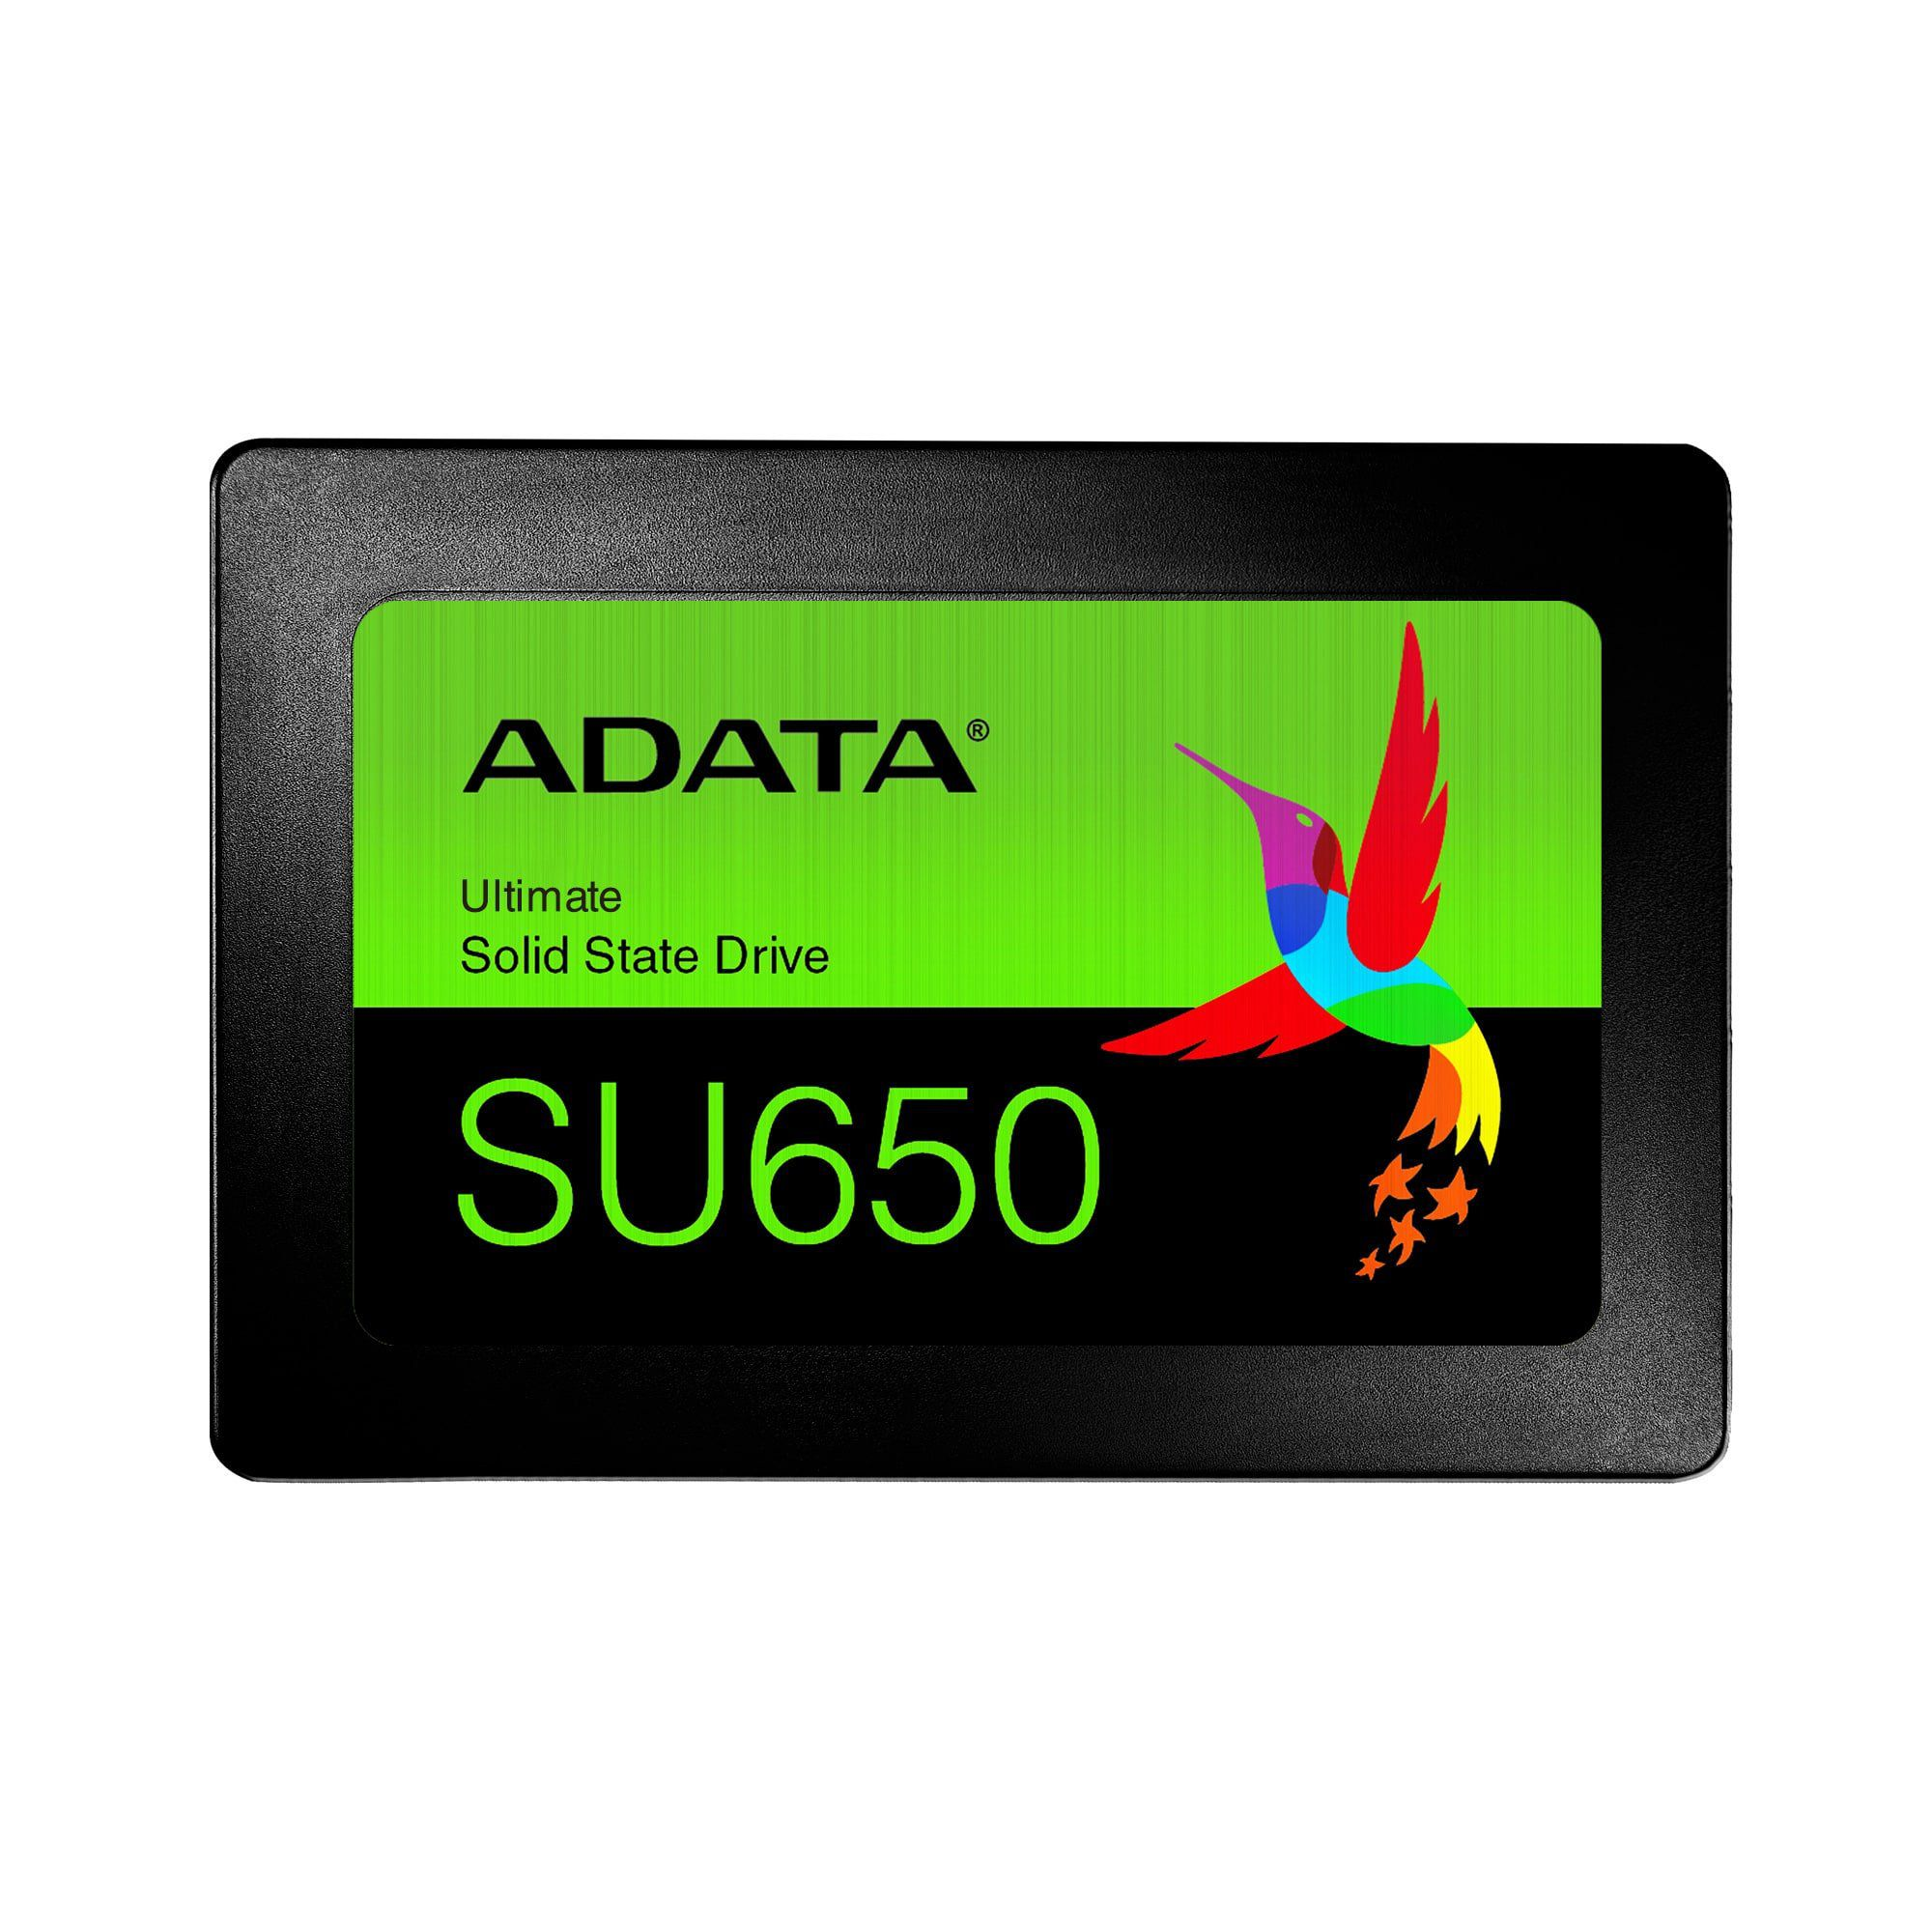 SSD 240GB SU650 Ultimate Sata III 2.5 ASU650SS-240GT-C - Adata